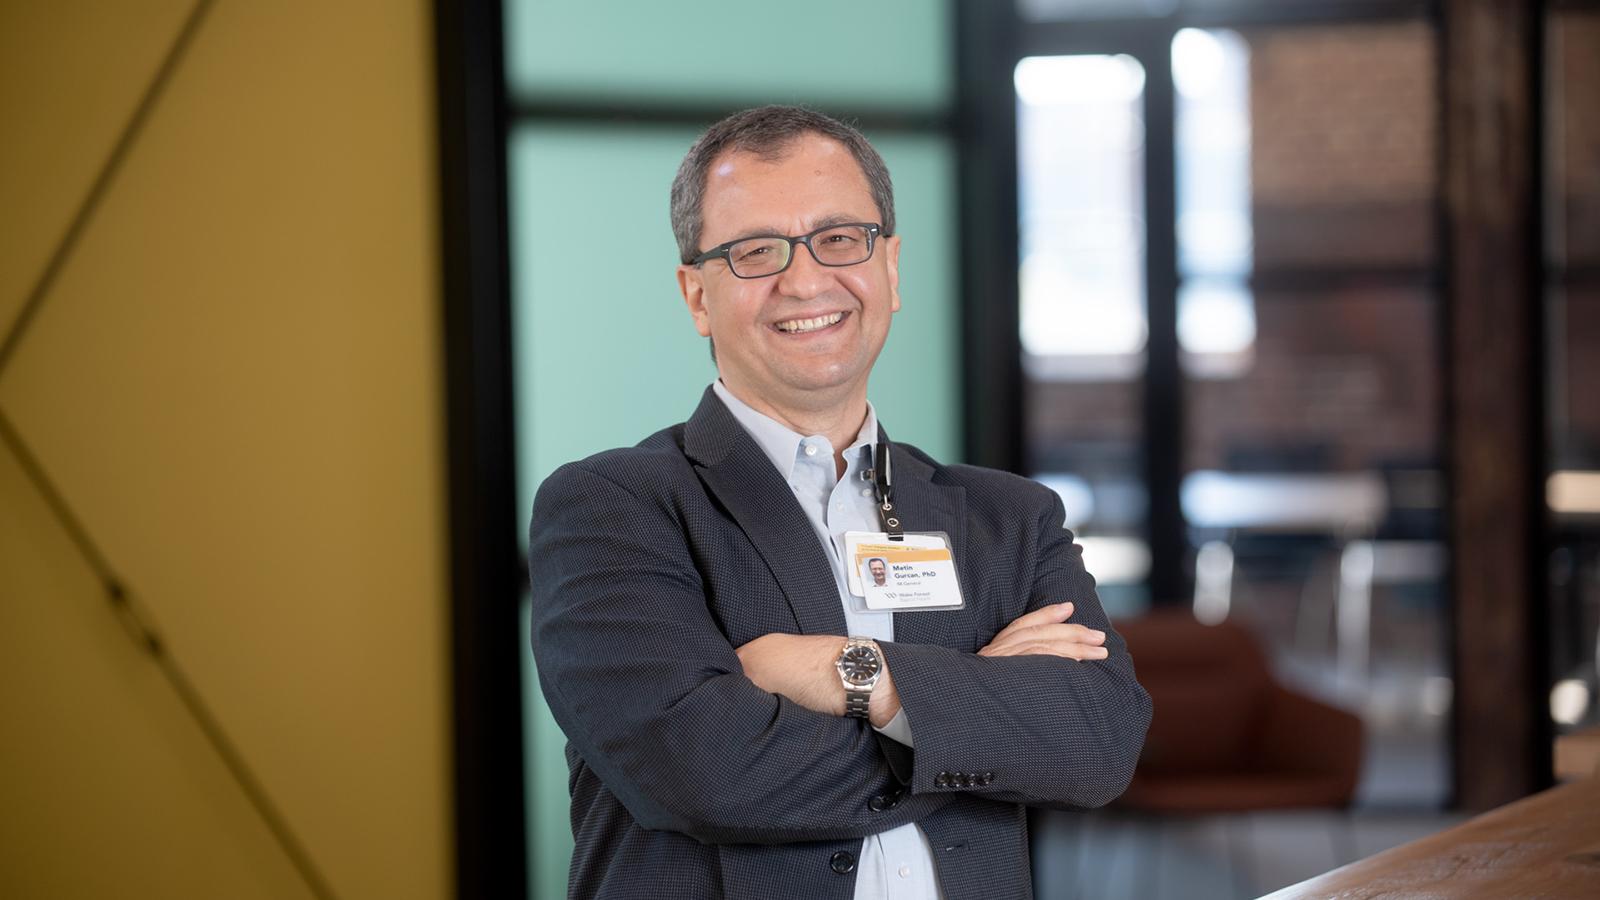 Metin Gurcan, PhD